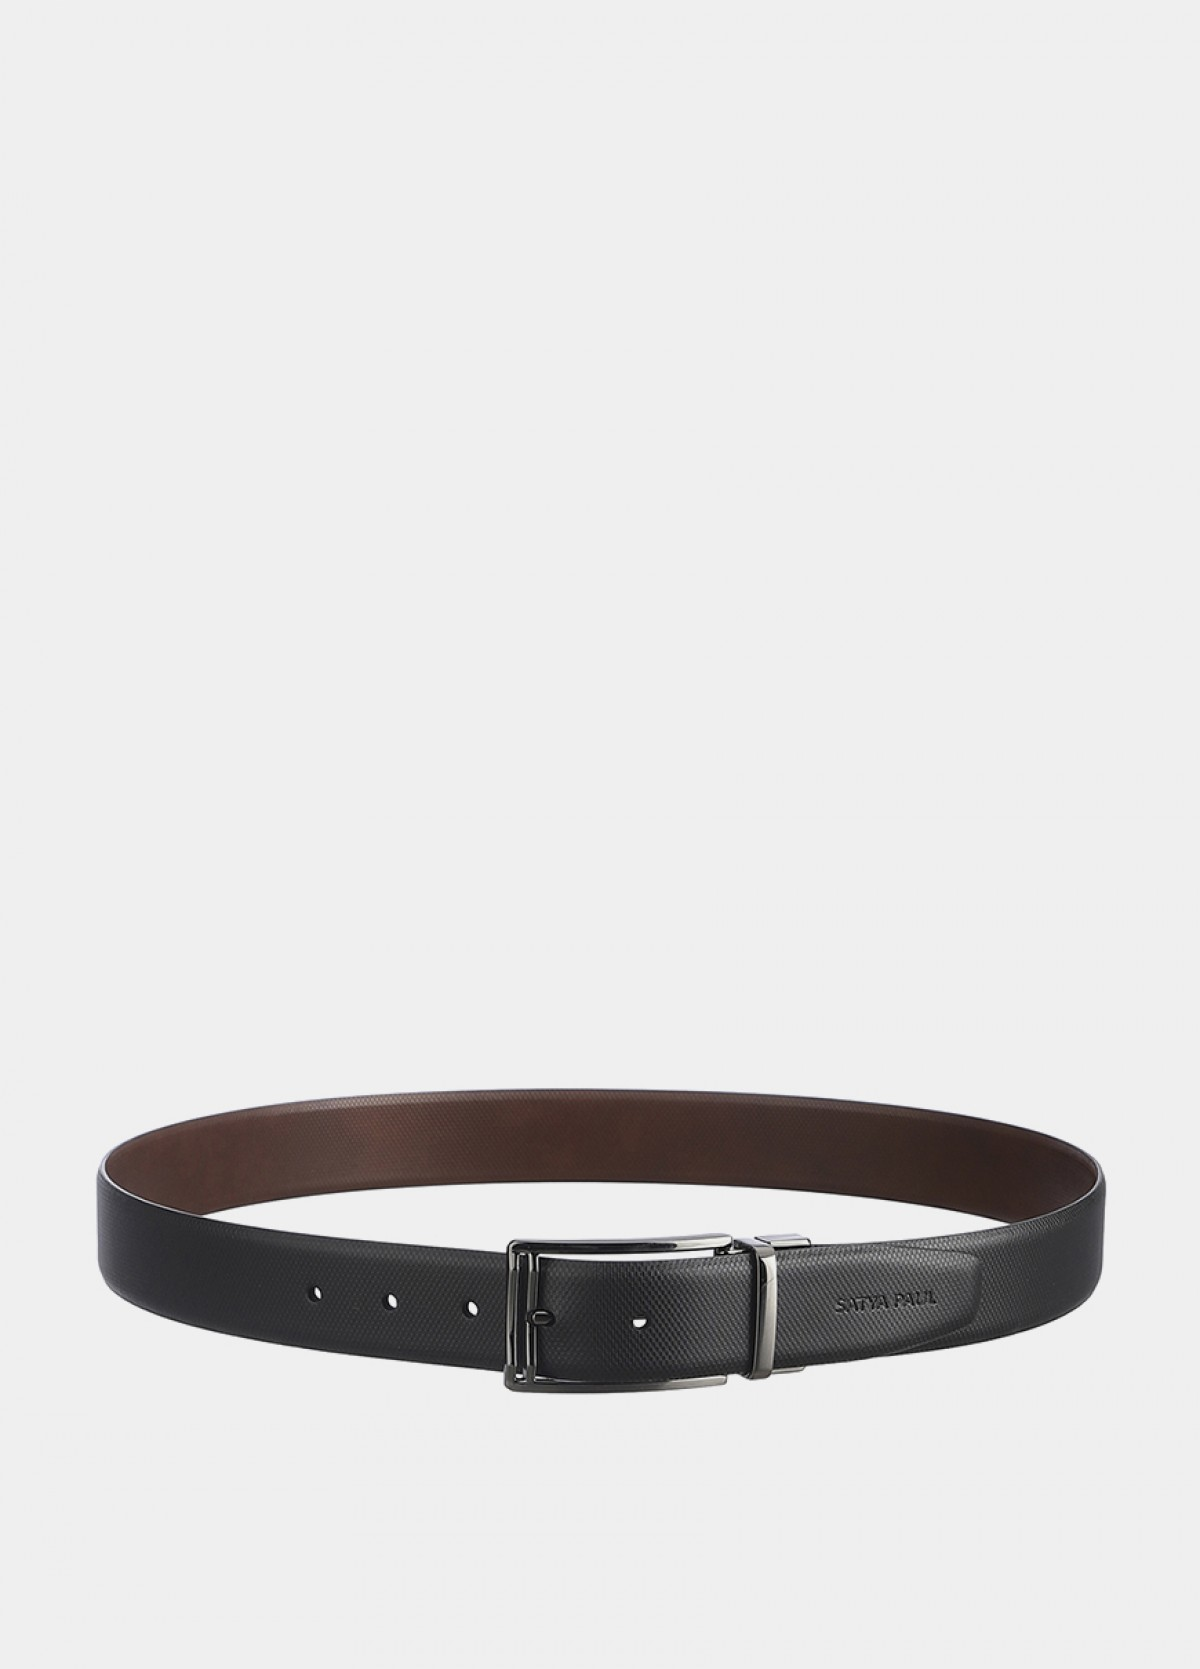 The Reversible Black Leather Belt